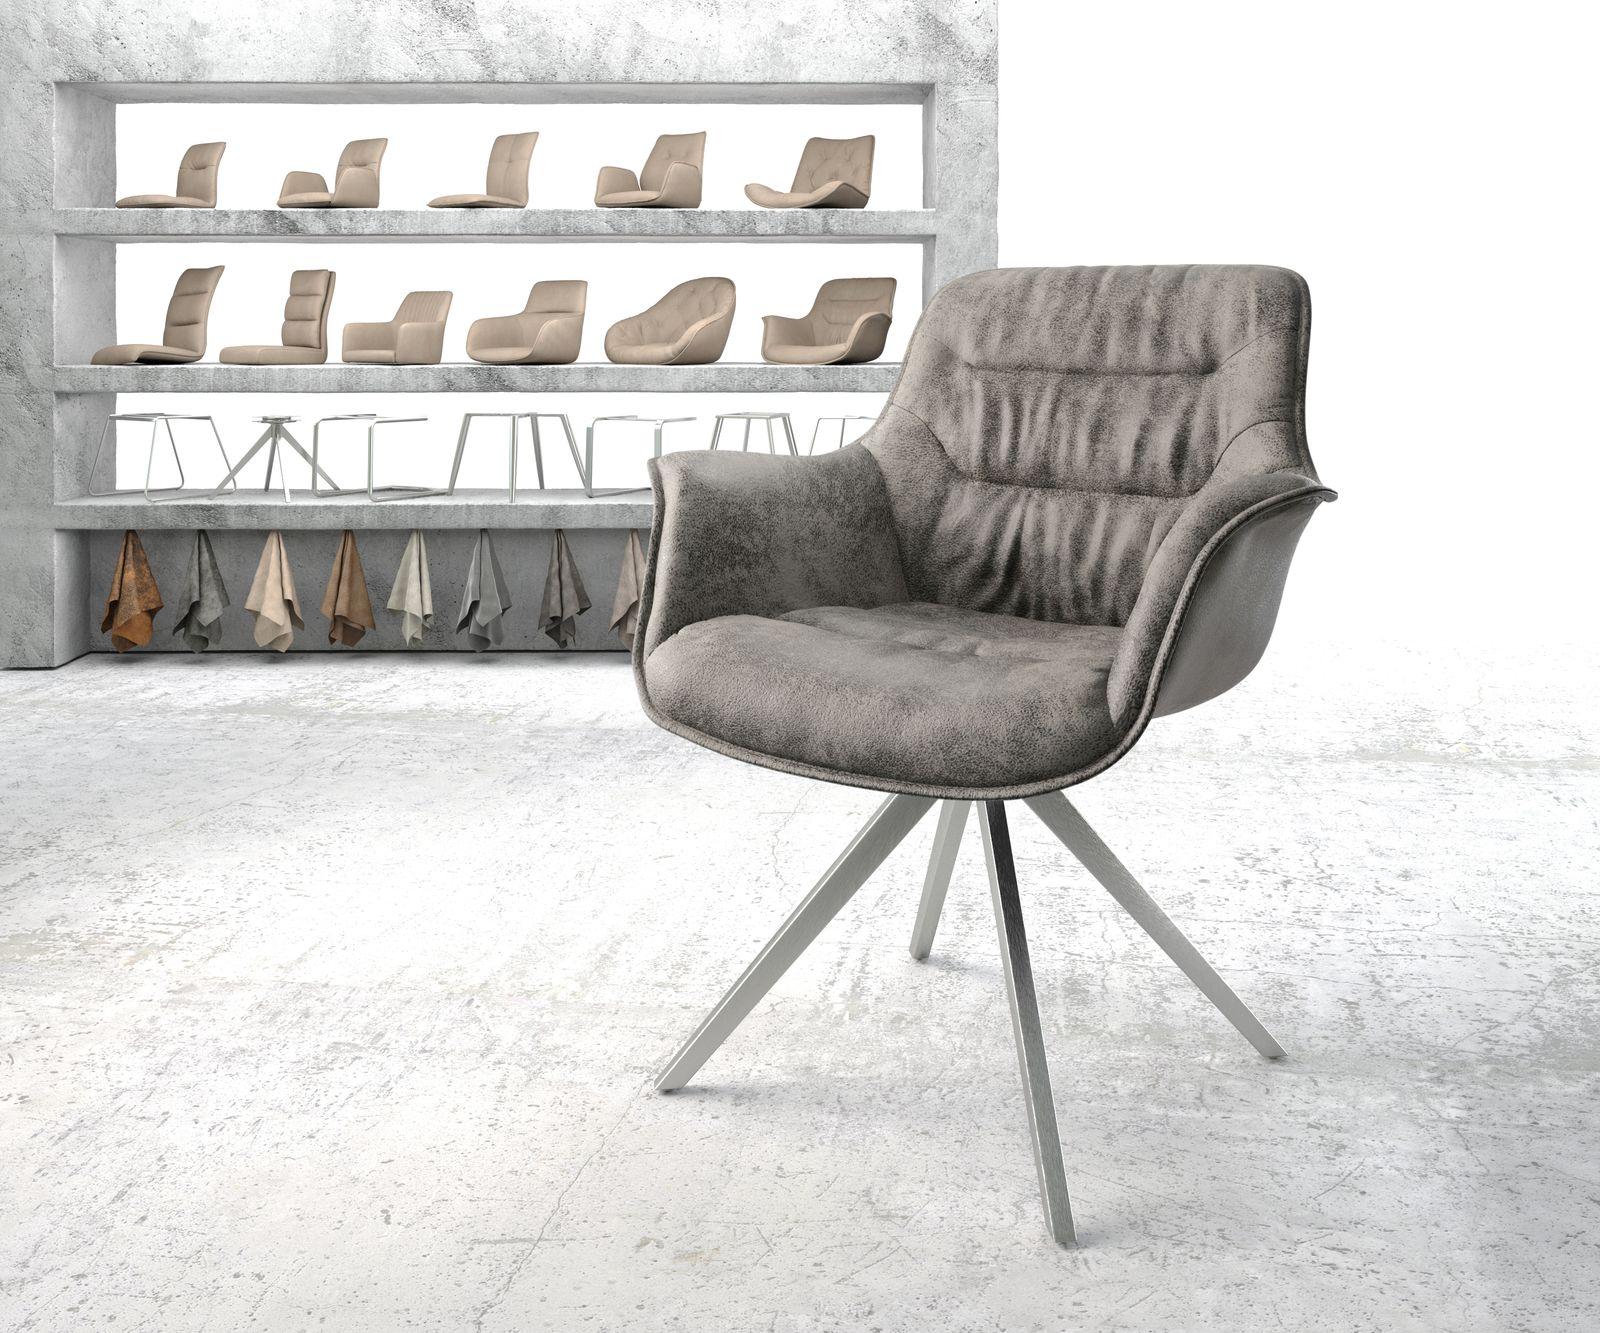 delife-armlehnstuhl-kaira-flex-grau-vintage-kreuzgestell-drehbar-edelstahl-esszimmerstuhle